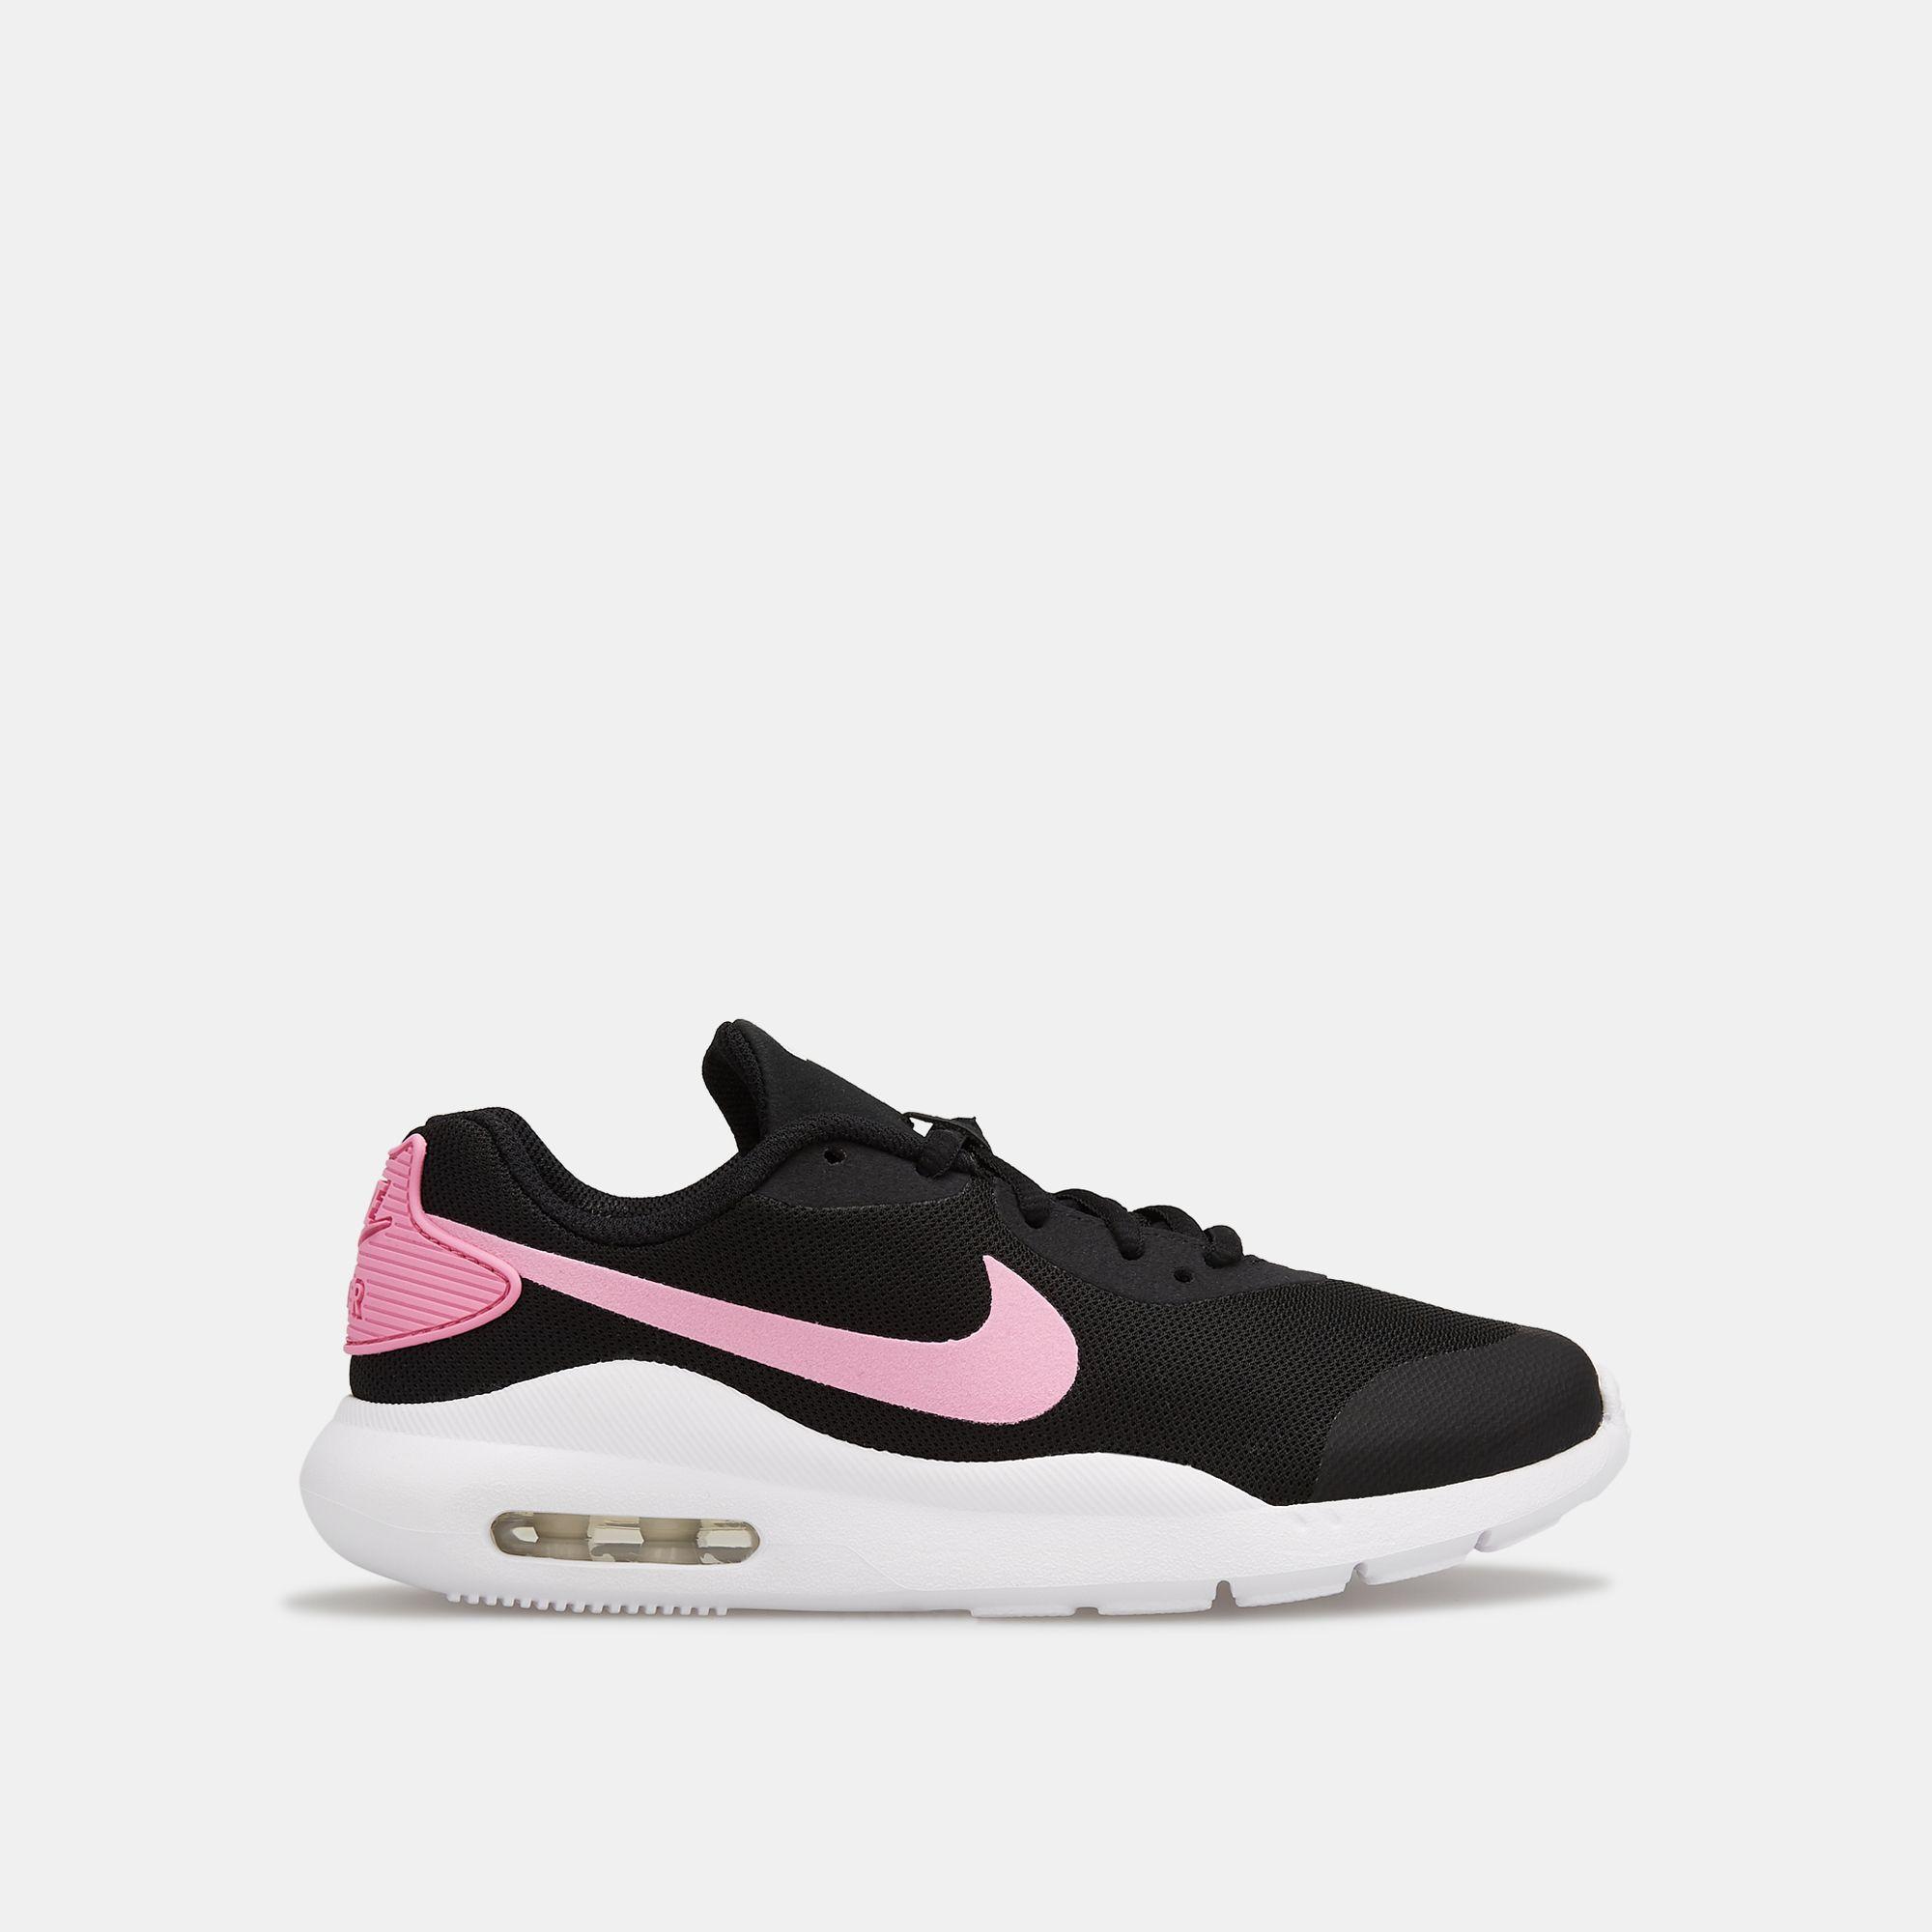 promo code 43cd0 2b280 Nike Kids  Air Max Oketo Shoe (Older Kids)   Sneakers   Shoes   Sports  Fashion   Sports   SSS